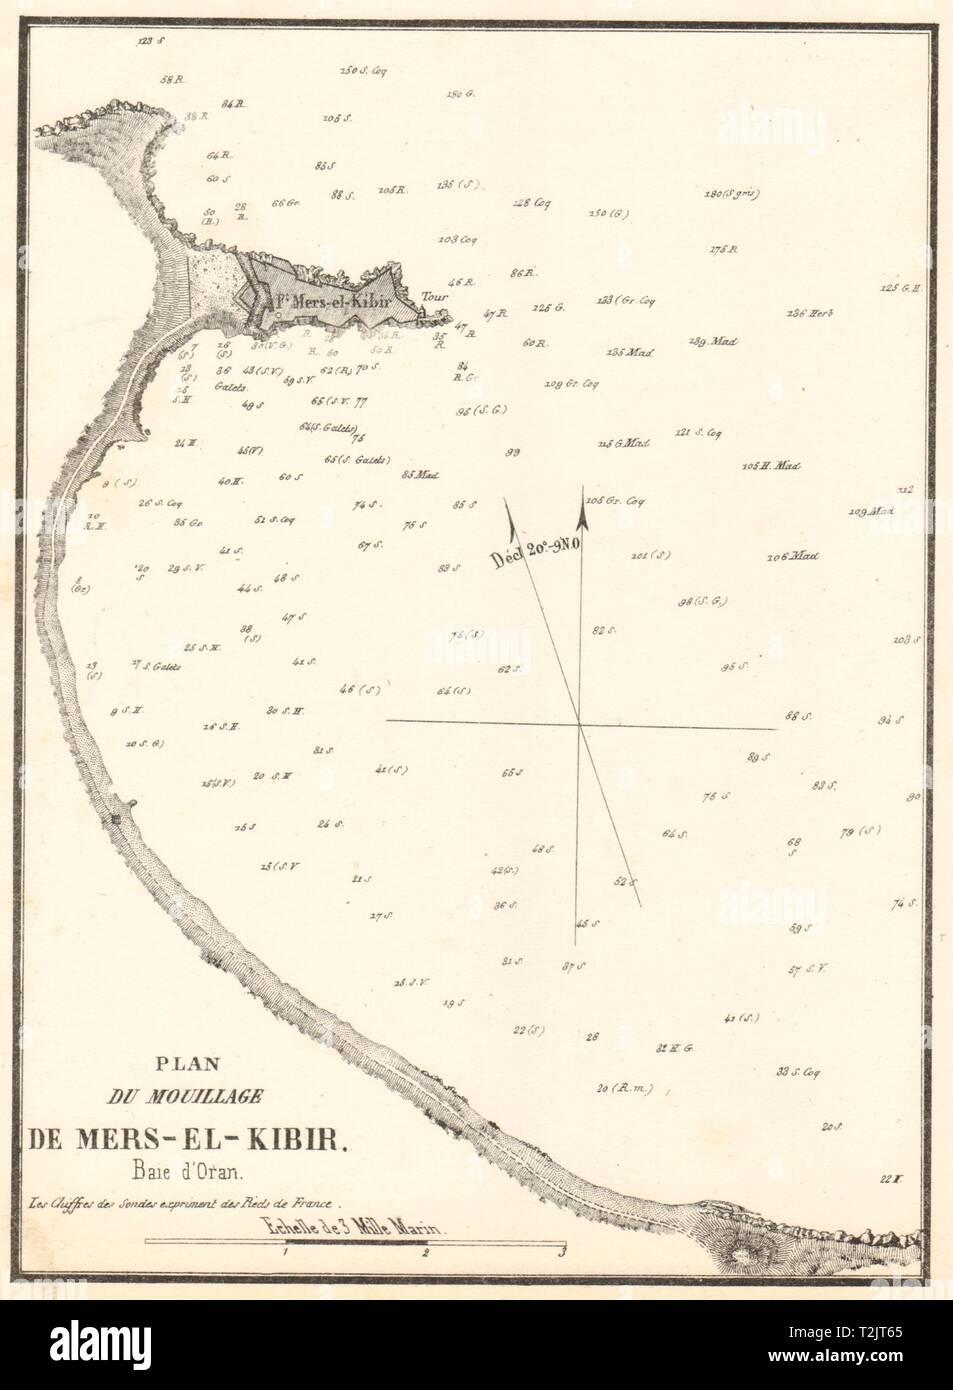 Mers-el-Kebir 3 July 1940 French Fleet attack Operation Catapult Sketch map 1954